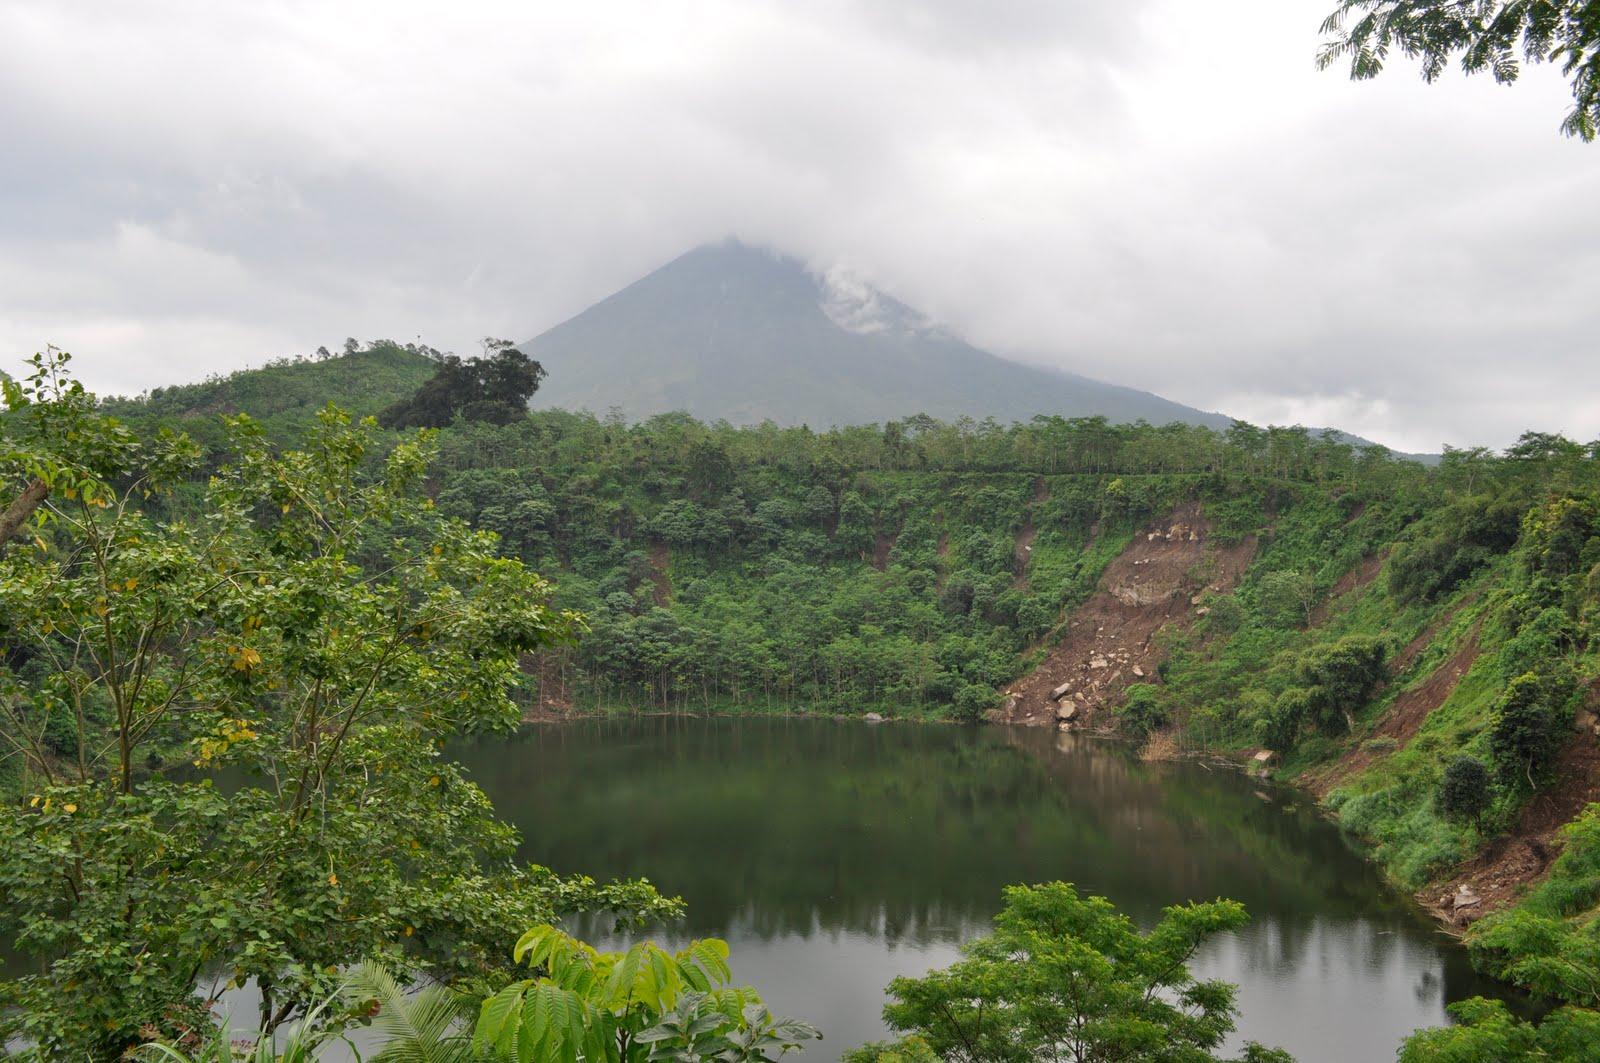 Ranu Lading Tempat Wisata Obyek Terletak Tengah Kebun Kopi Peninggalan